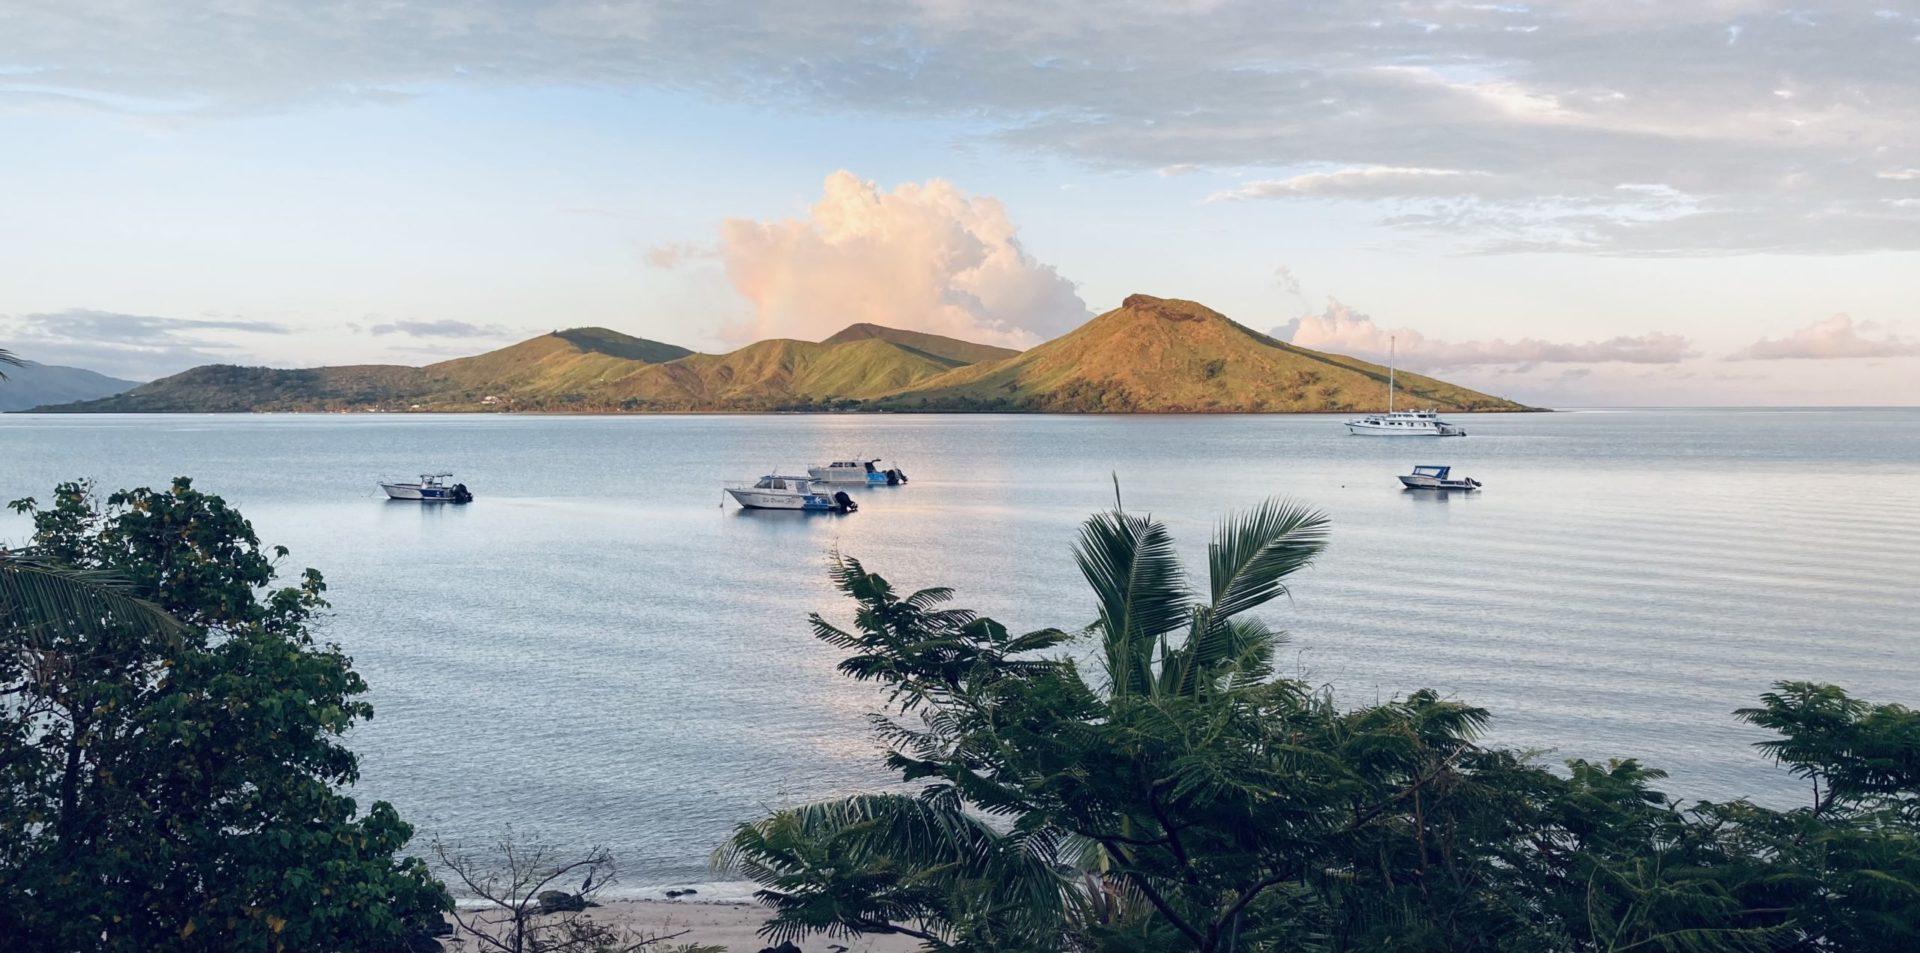 340 days COVID Free Fiji